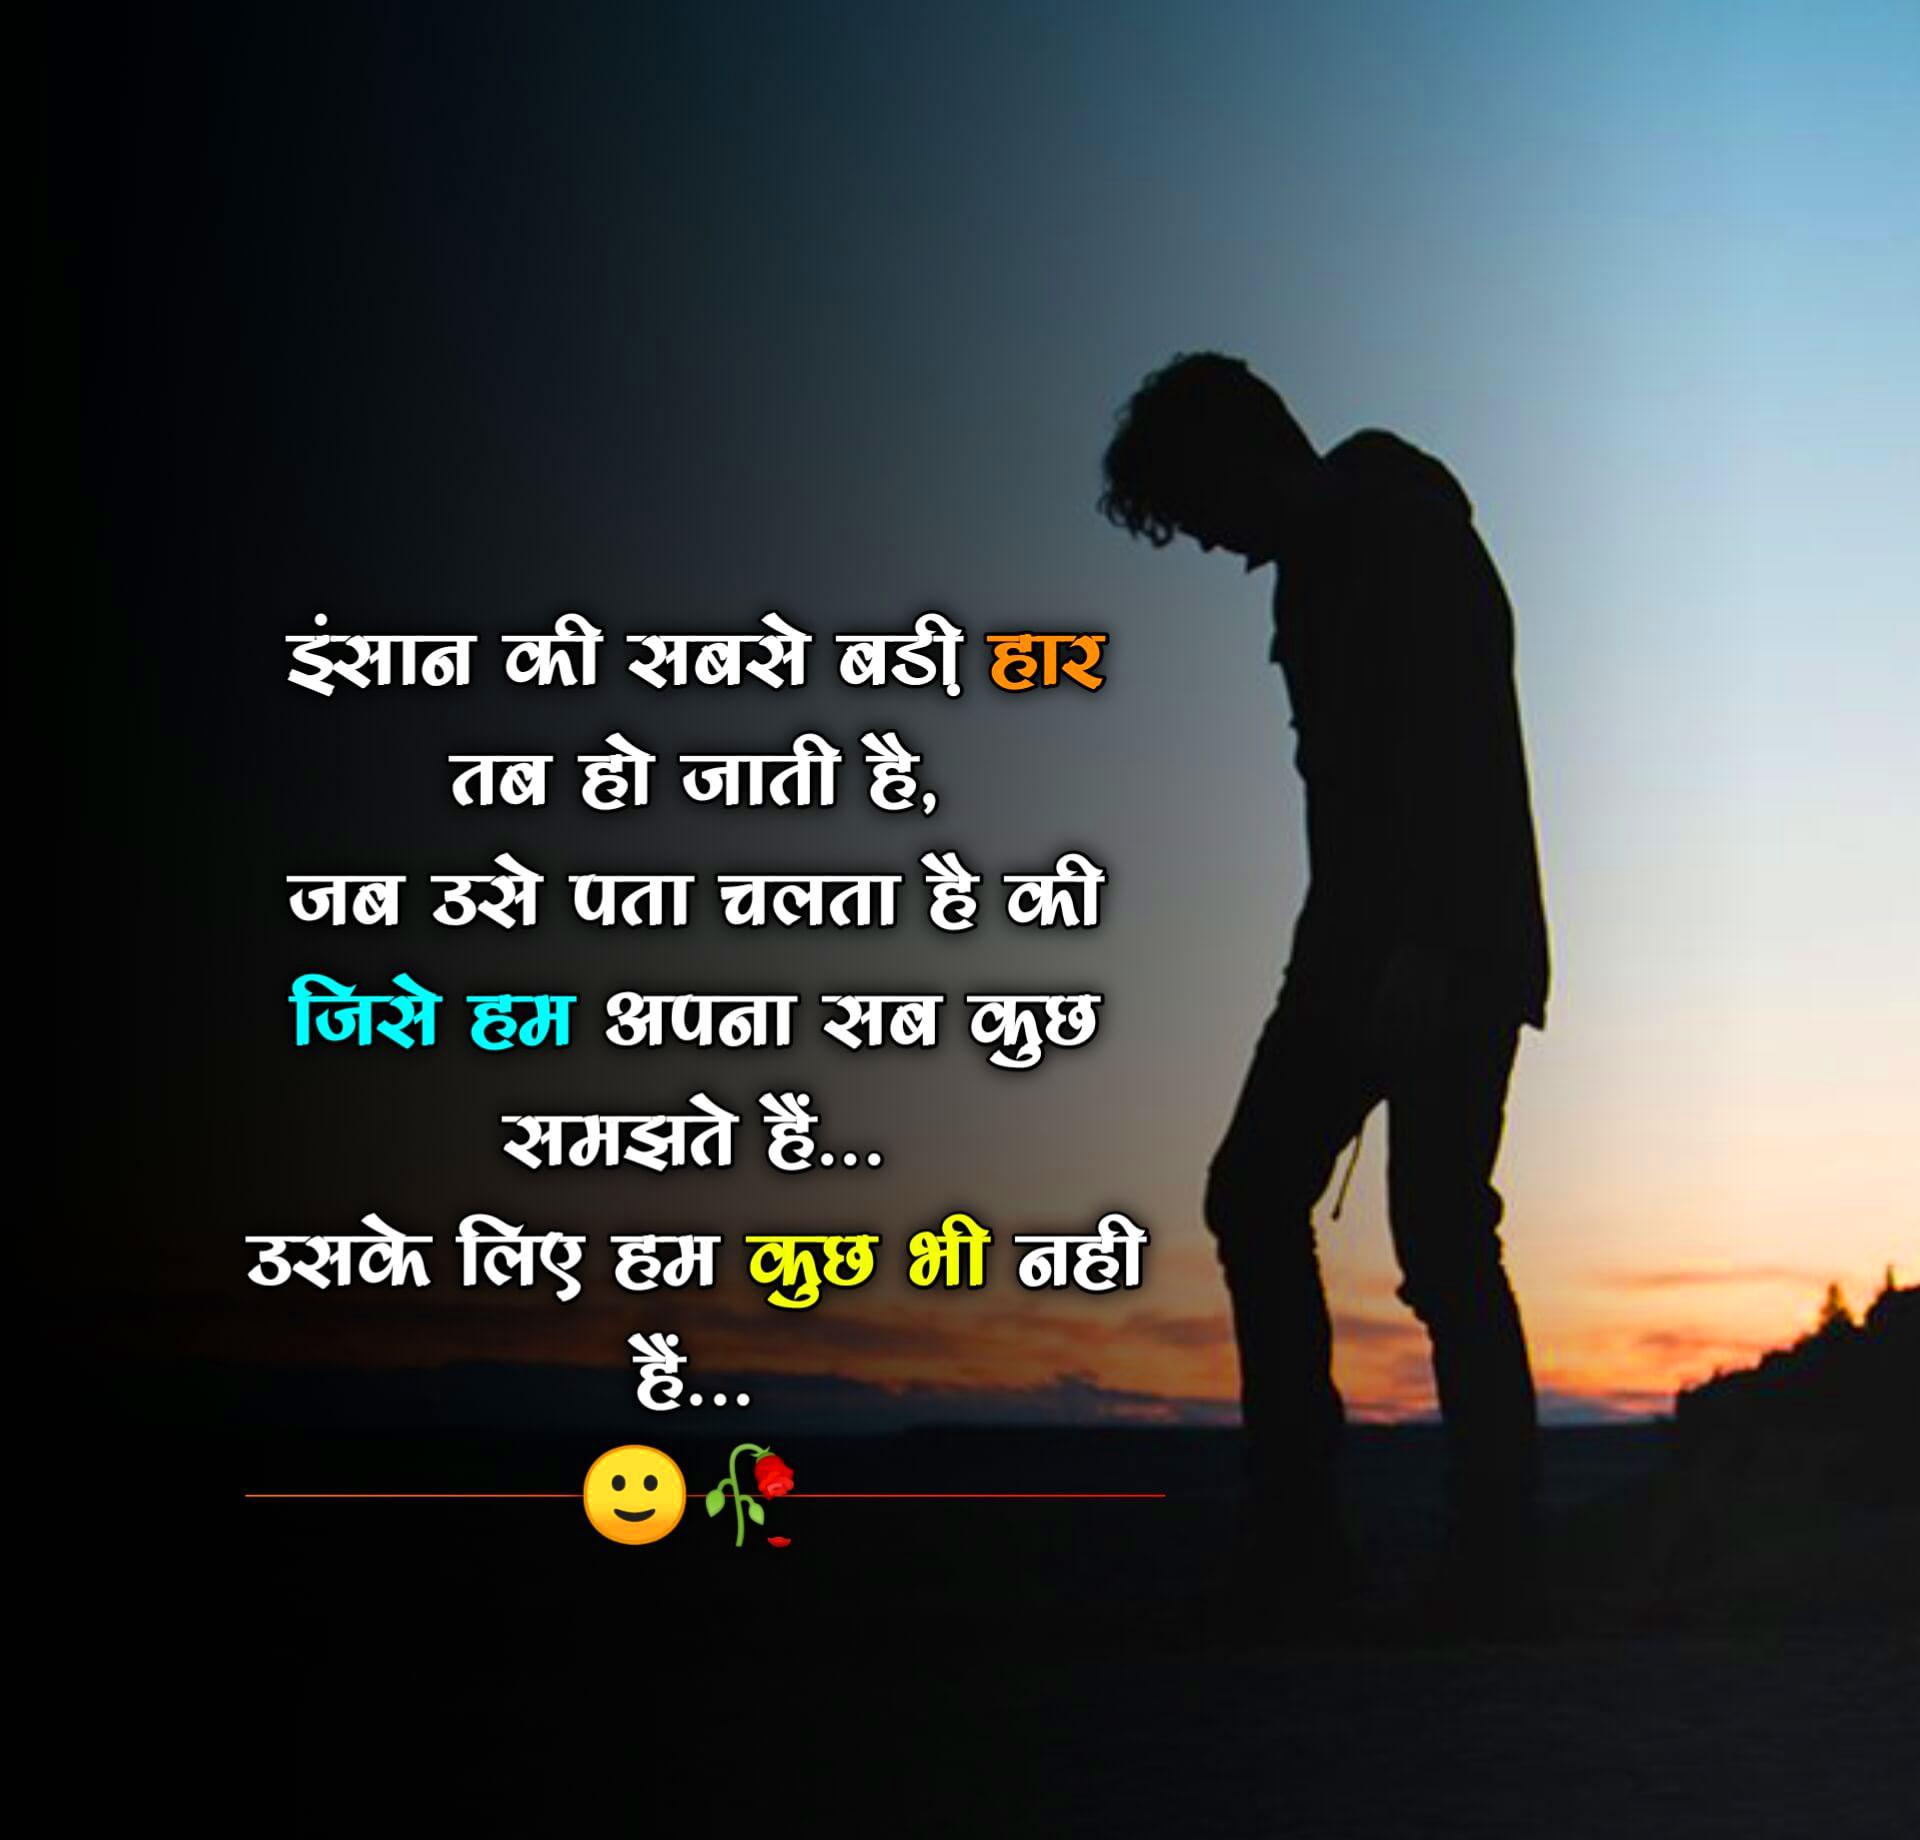 New Sad Boy Shayari Images wallpaper pics hd